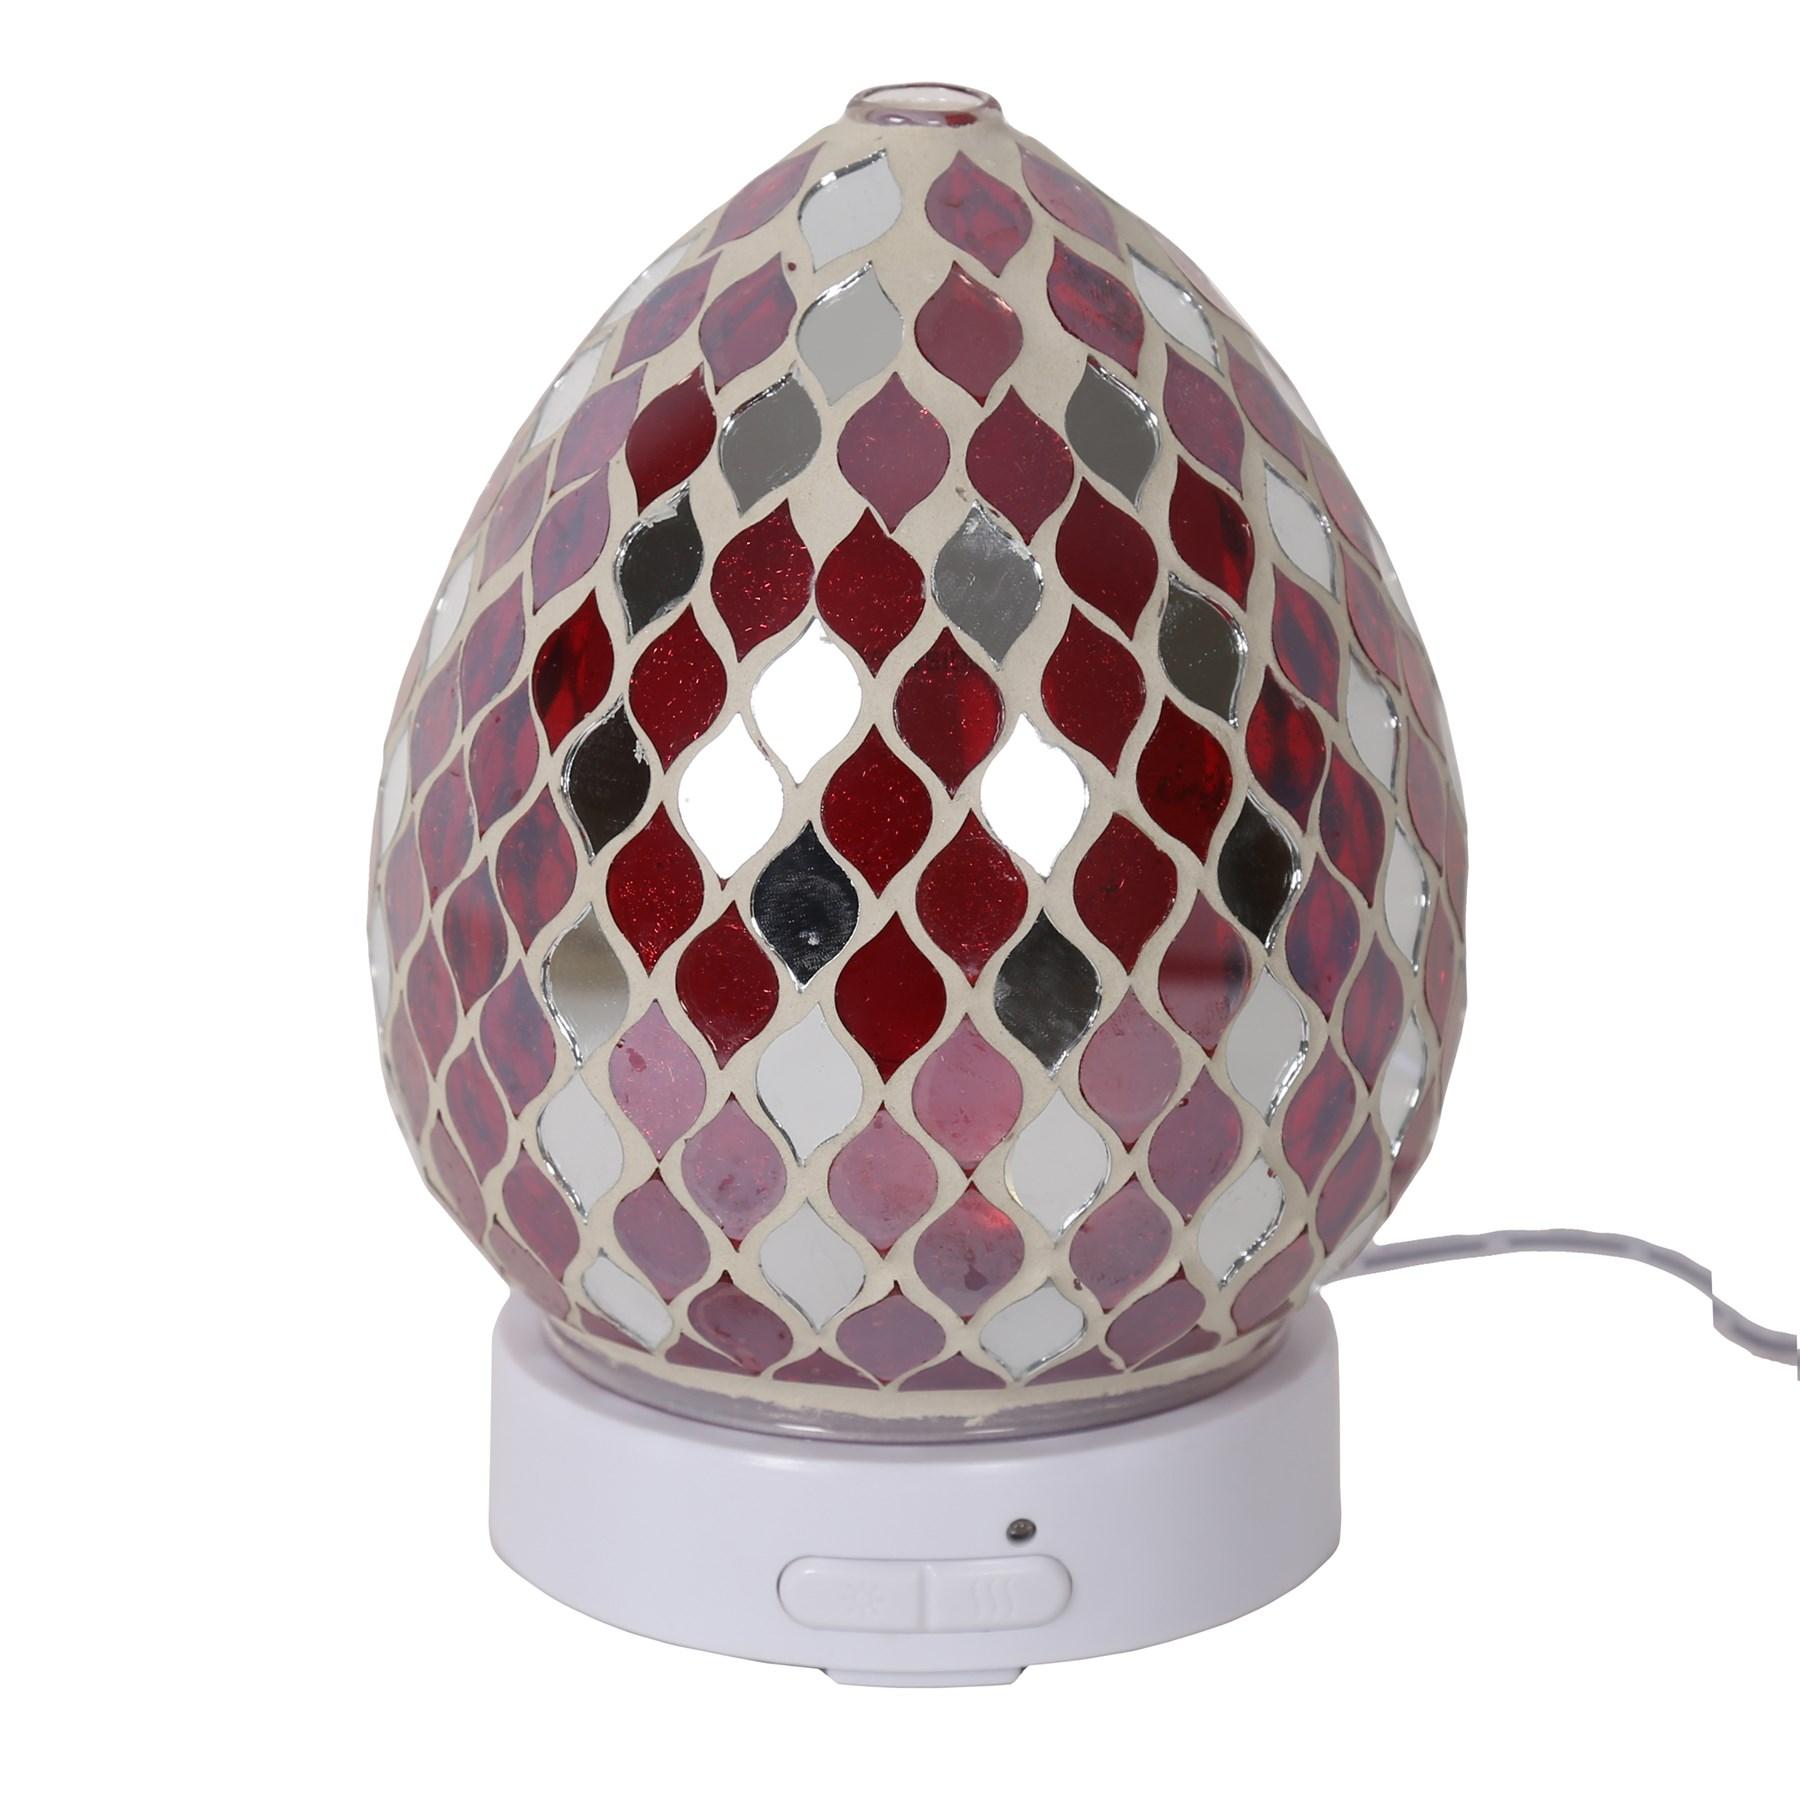 Red Mirror Teardrop LED Ultrasonic Diffuser